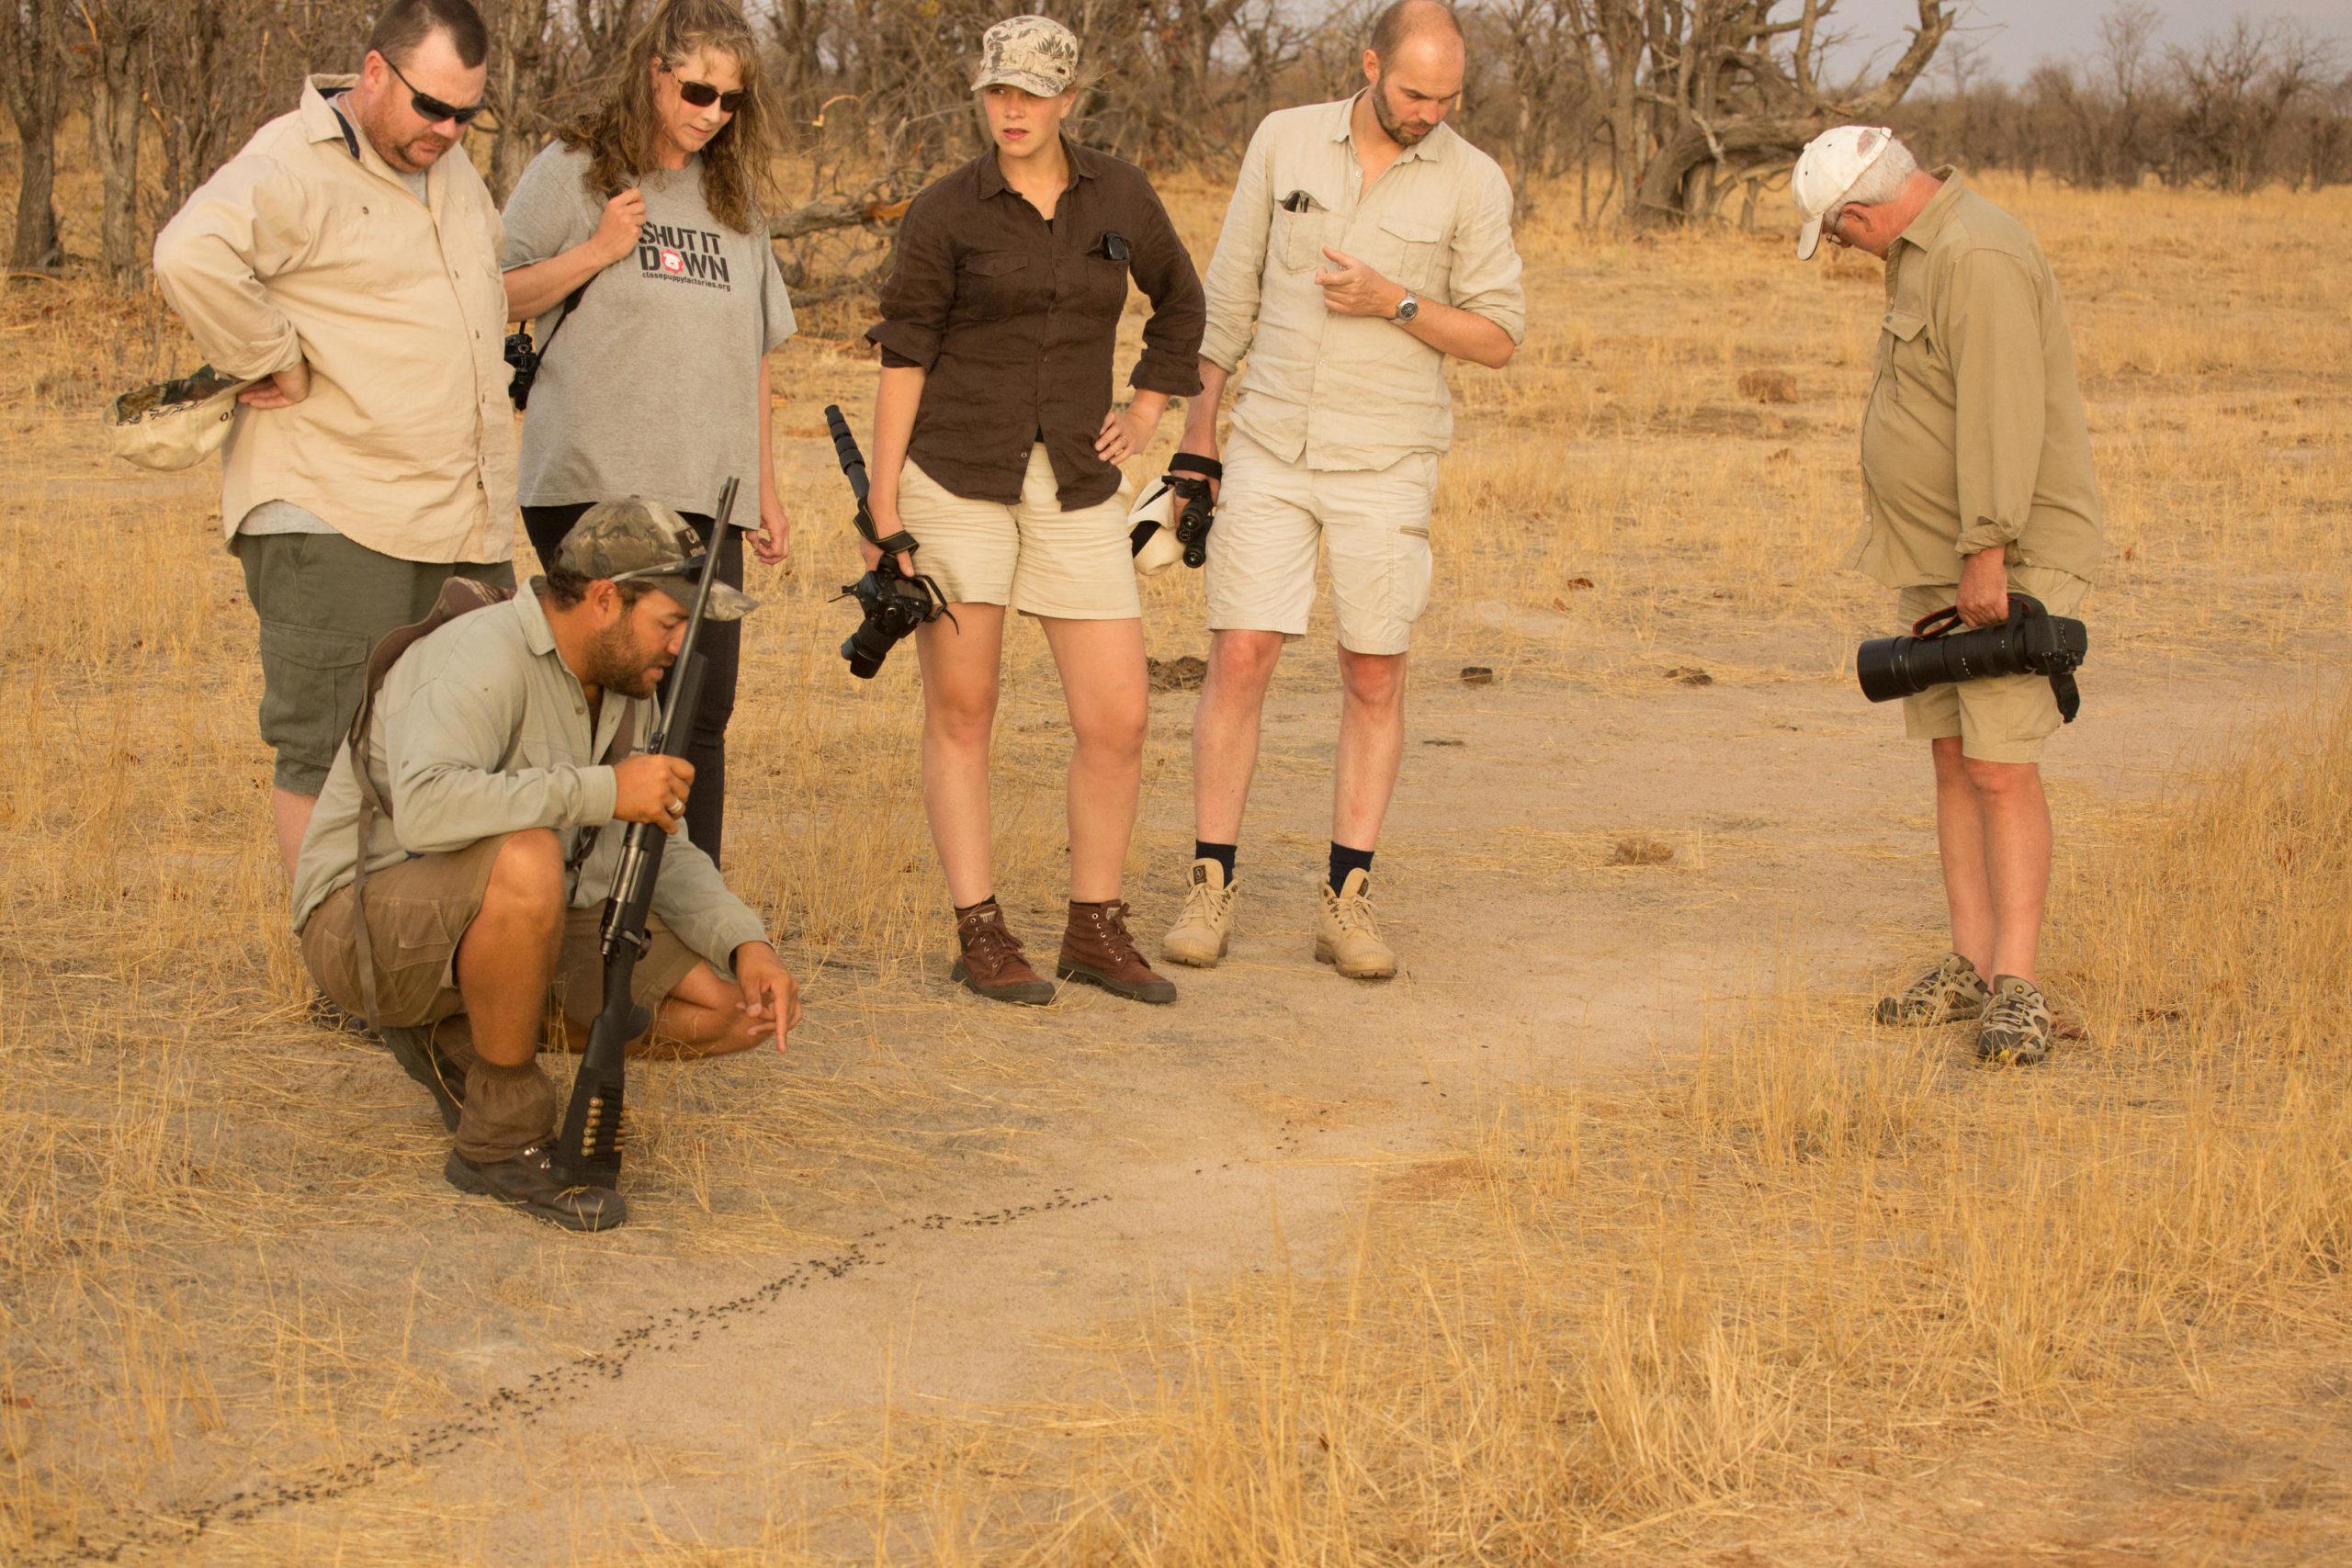 Walking safari with guide